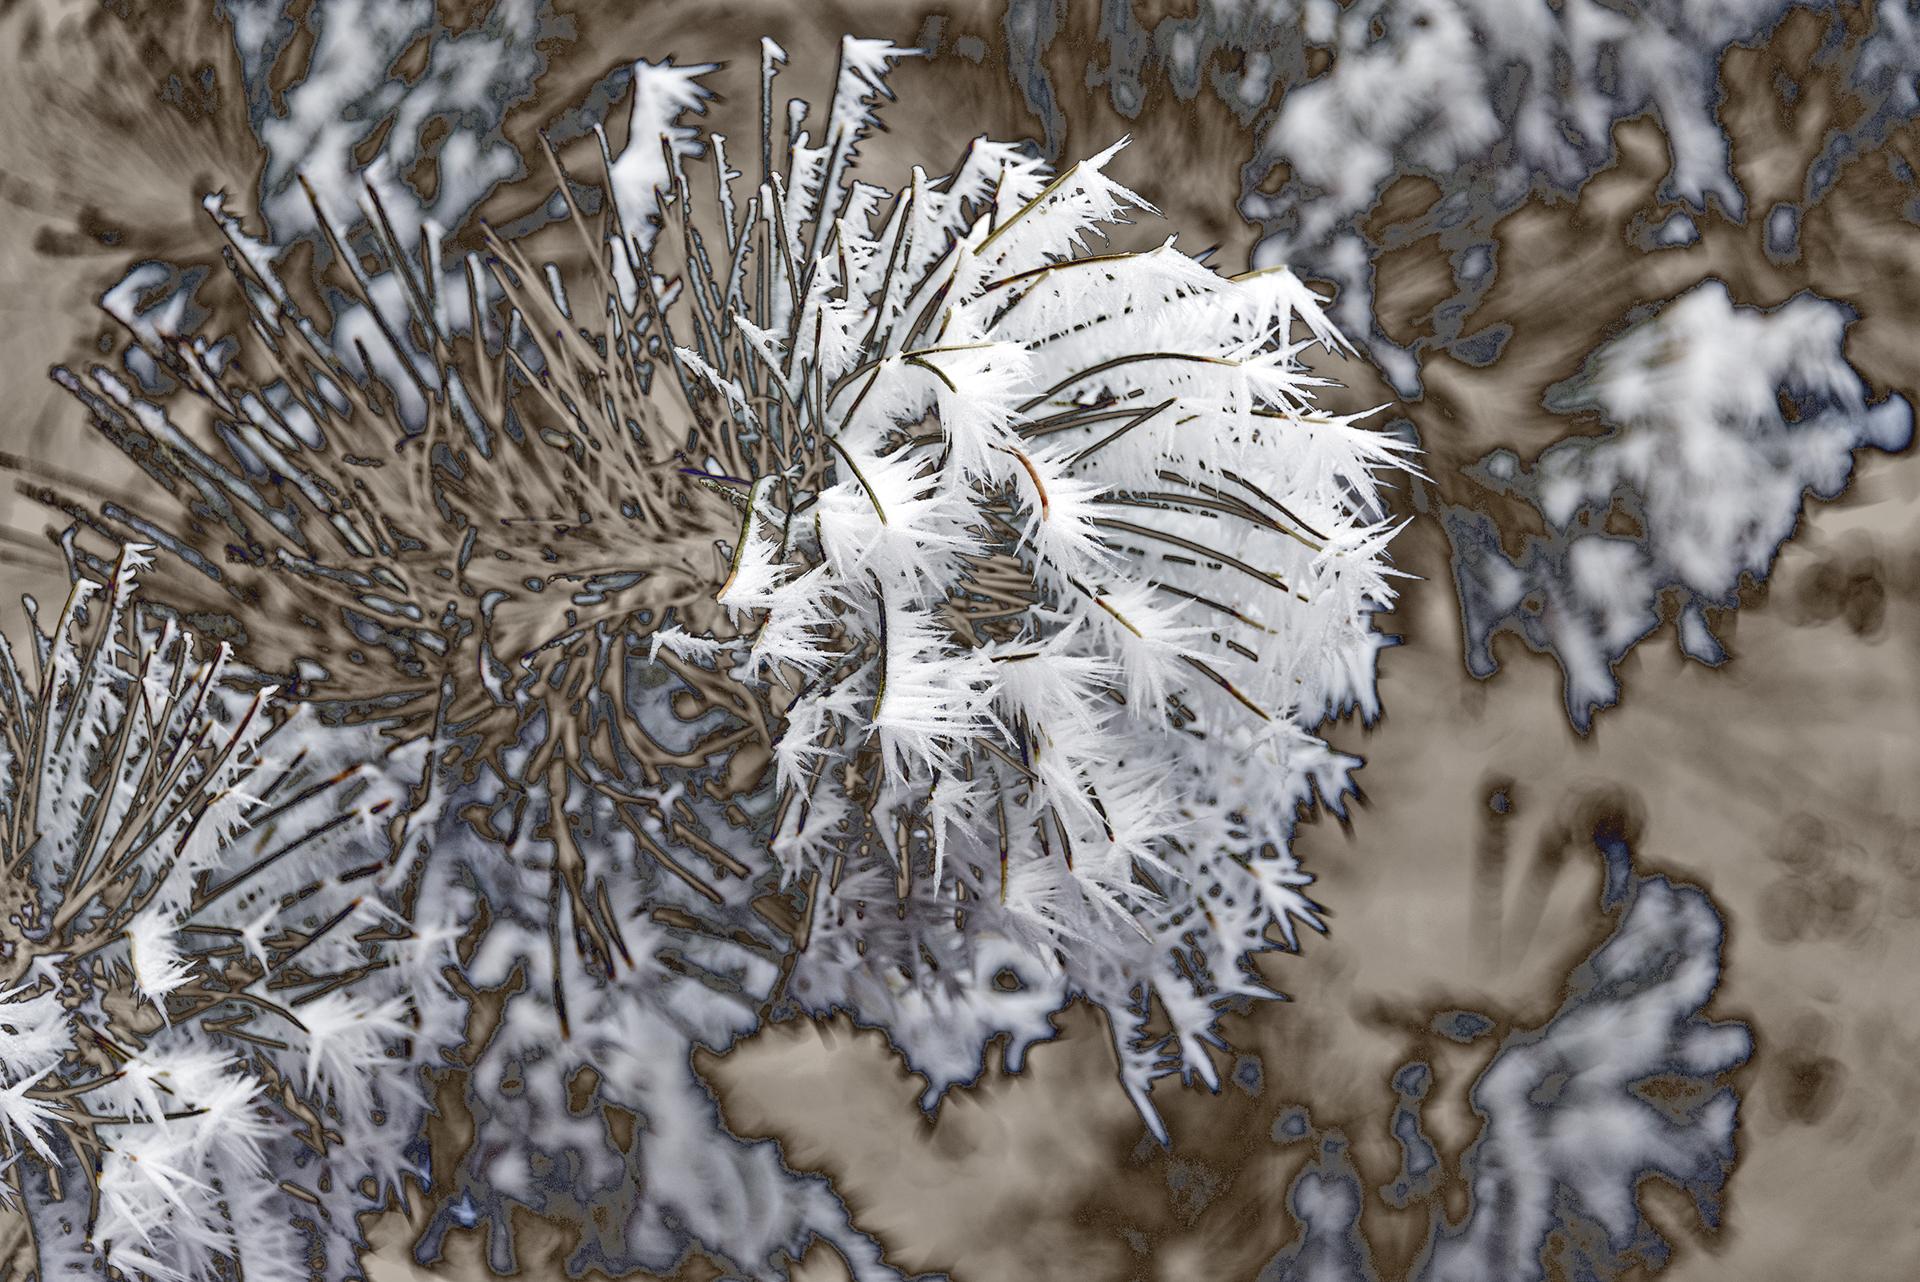 Bonny Lhotka  Pine Frost #4  UV & borosilicate pigments  30x40